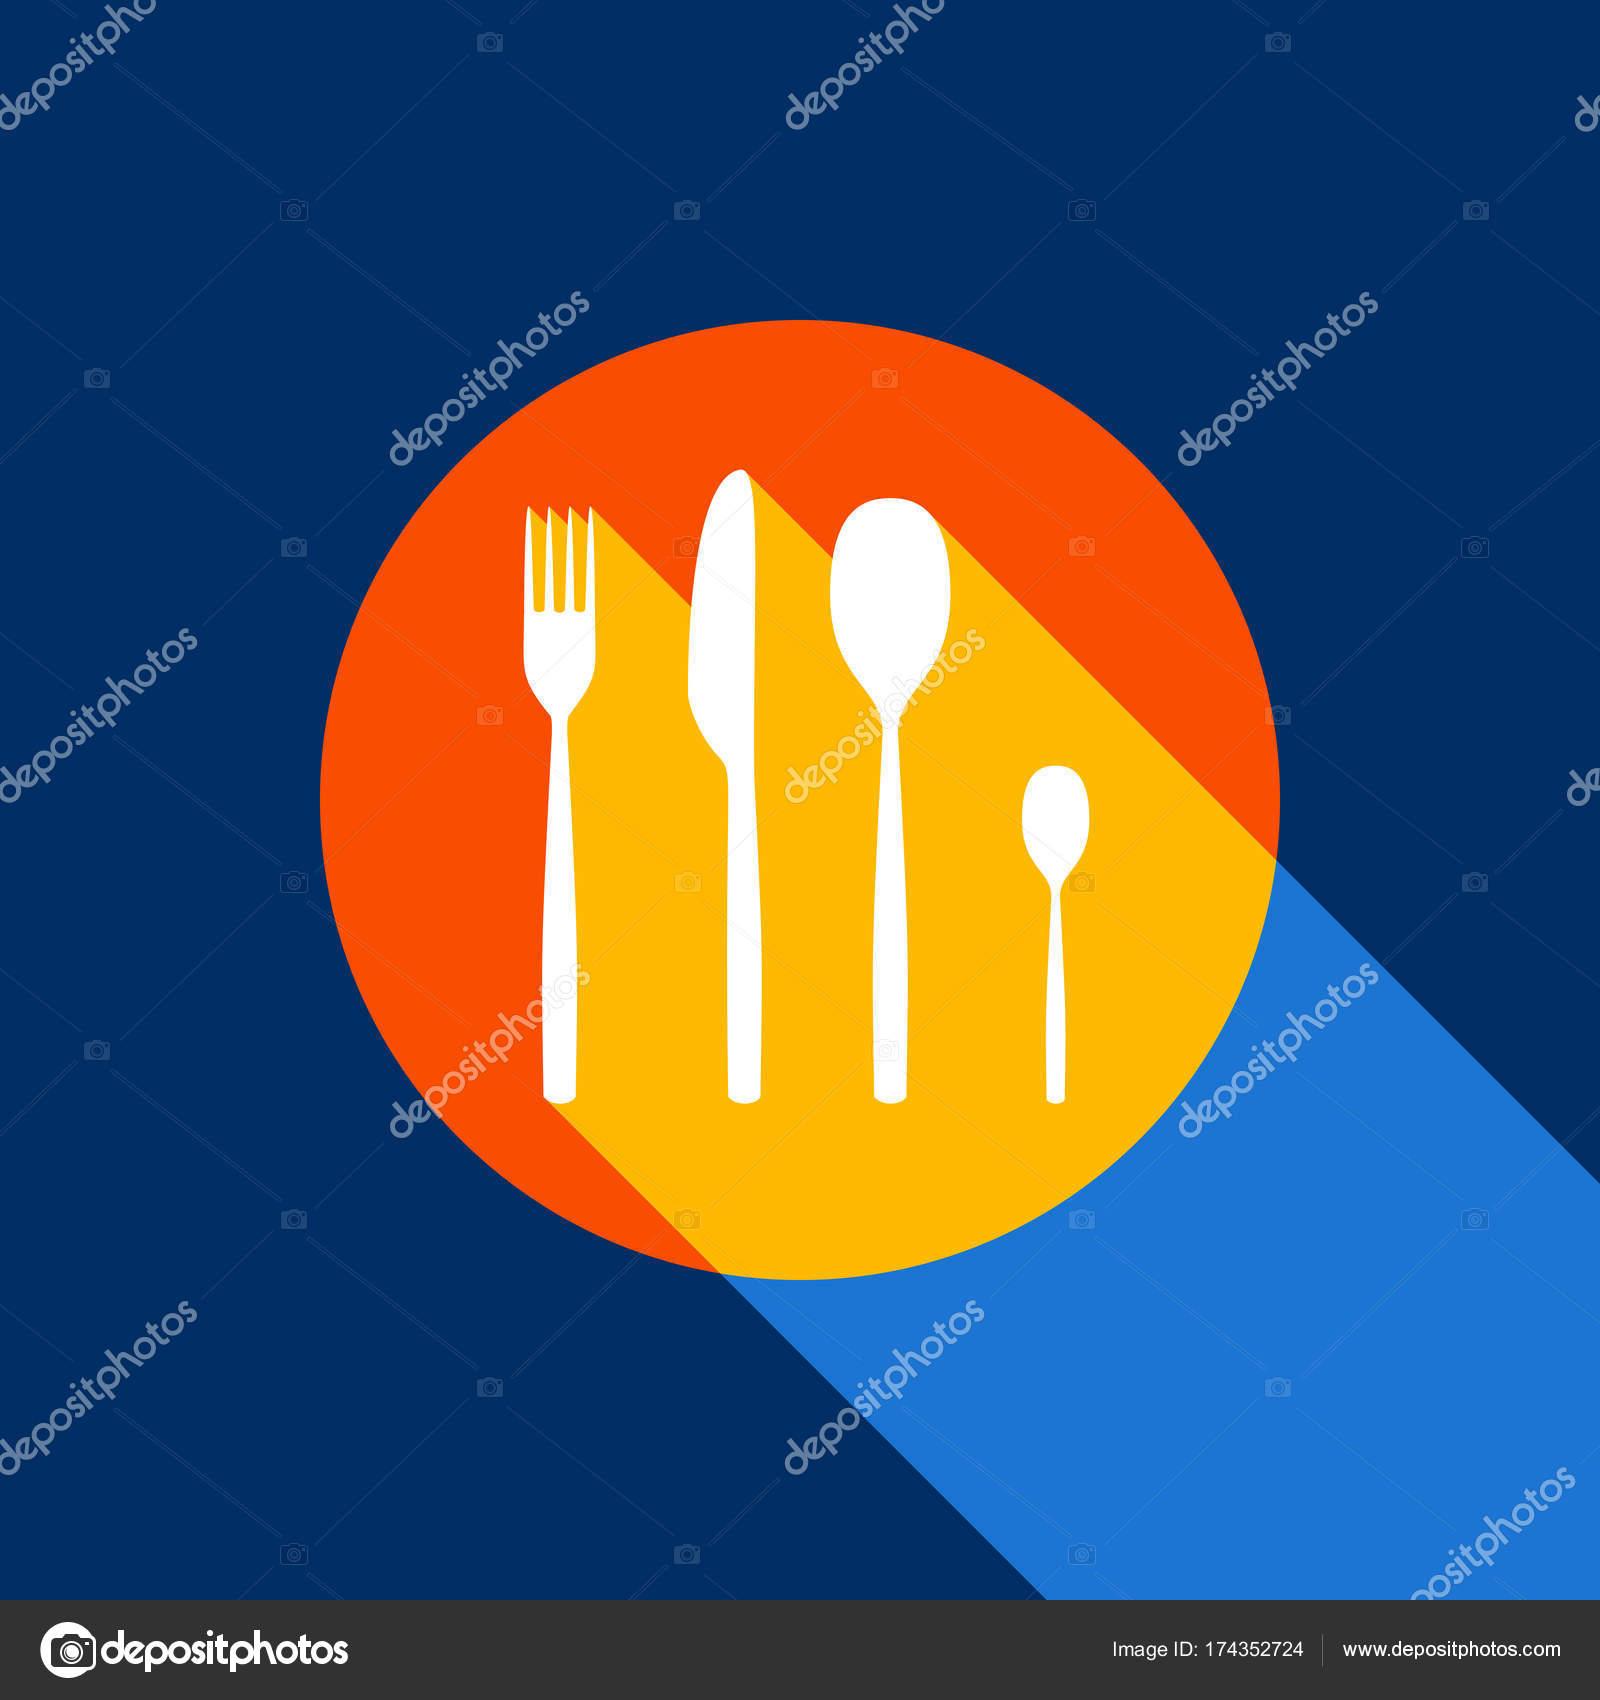 cool kitchen knives 6 foot island 叉子勺和刀的符号 矢量 白色的图标在柚的圆圈与无限阴影的光在凉爽的 白色的图标在柚的圆圈与无限阴影的光在凉爽的黑色背景 有选择的黄色和明亮的海军蓝色被生产